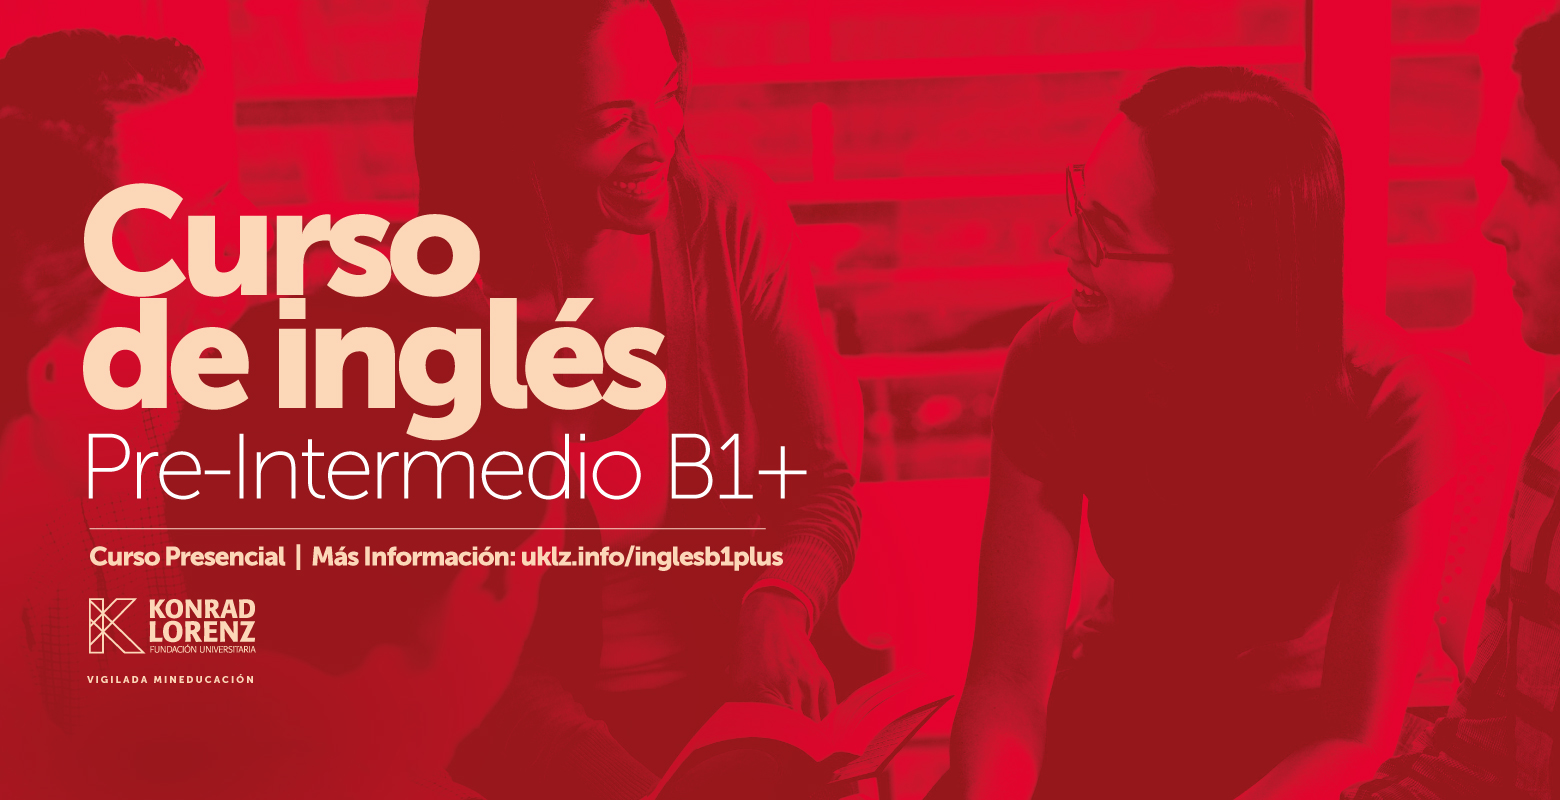 Curso Inglés Pre-Intermedio B1+